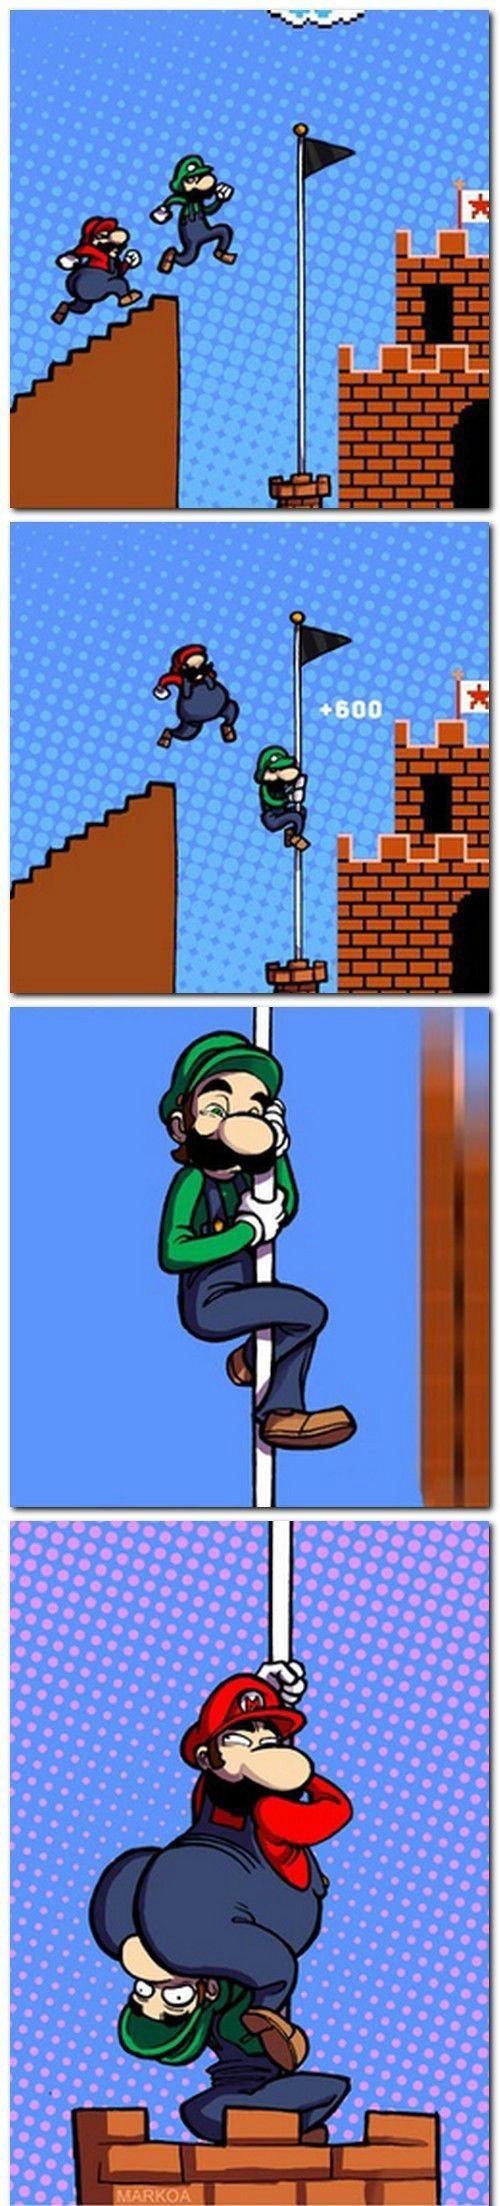 mario & luigi. Super Mario Bros. (スーパーマリオブラザーズ Sūpā Mario Burazāzu?) is a 1985 platform video game internally developed by Nintendo EAD and published by Nintend Mario luigi